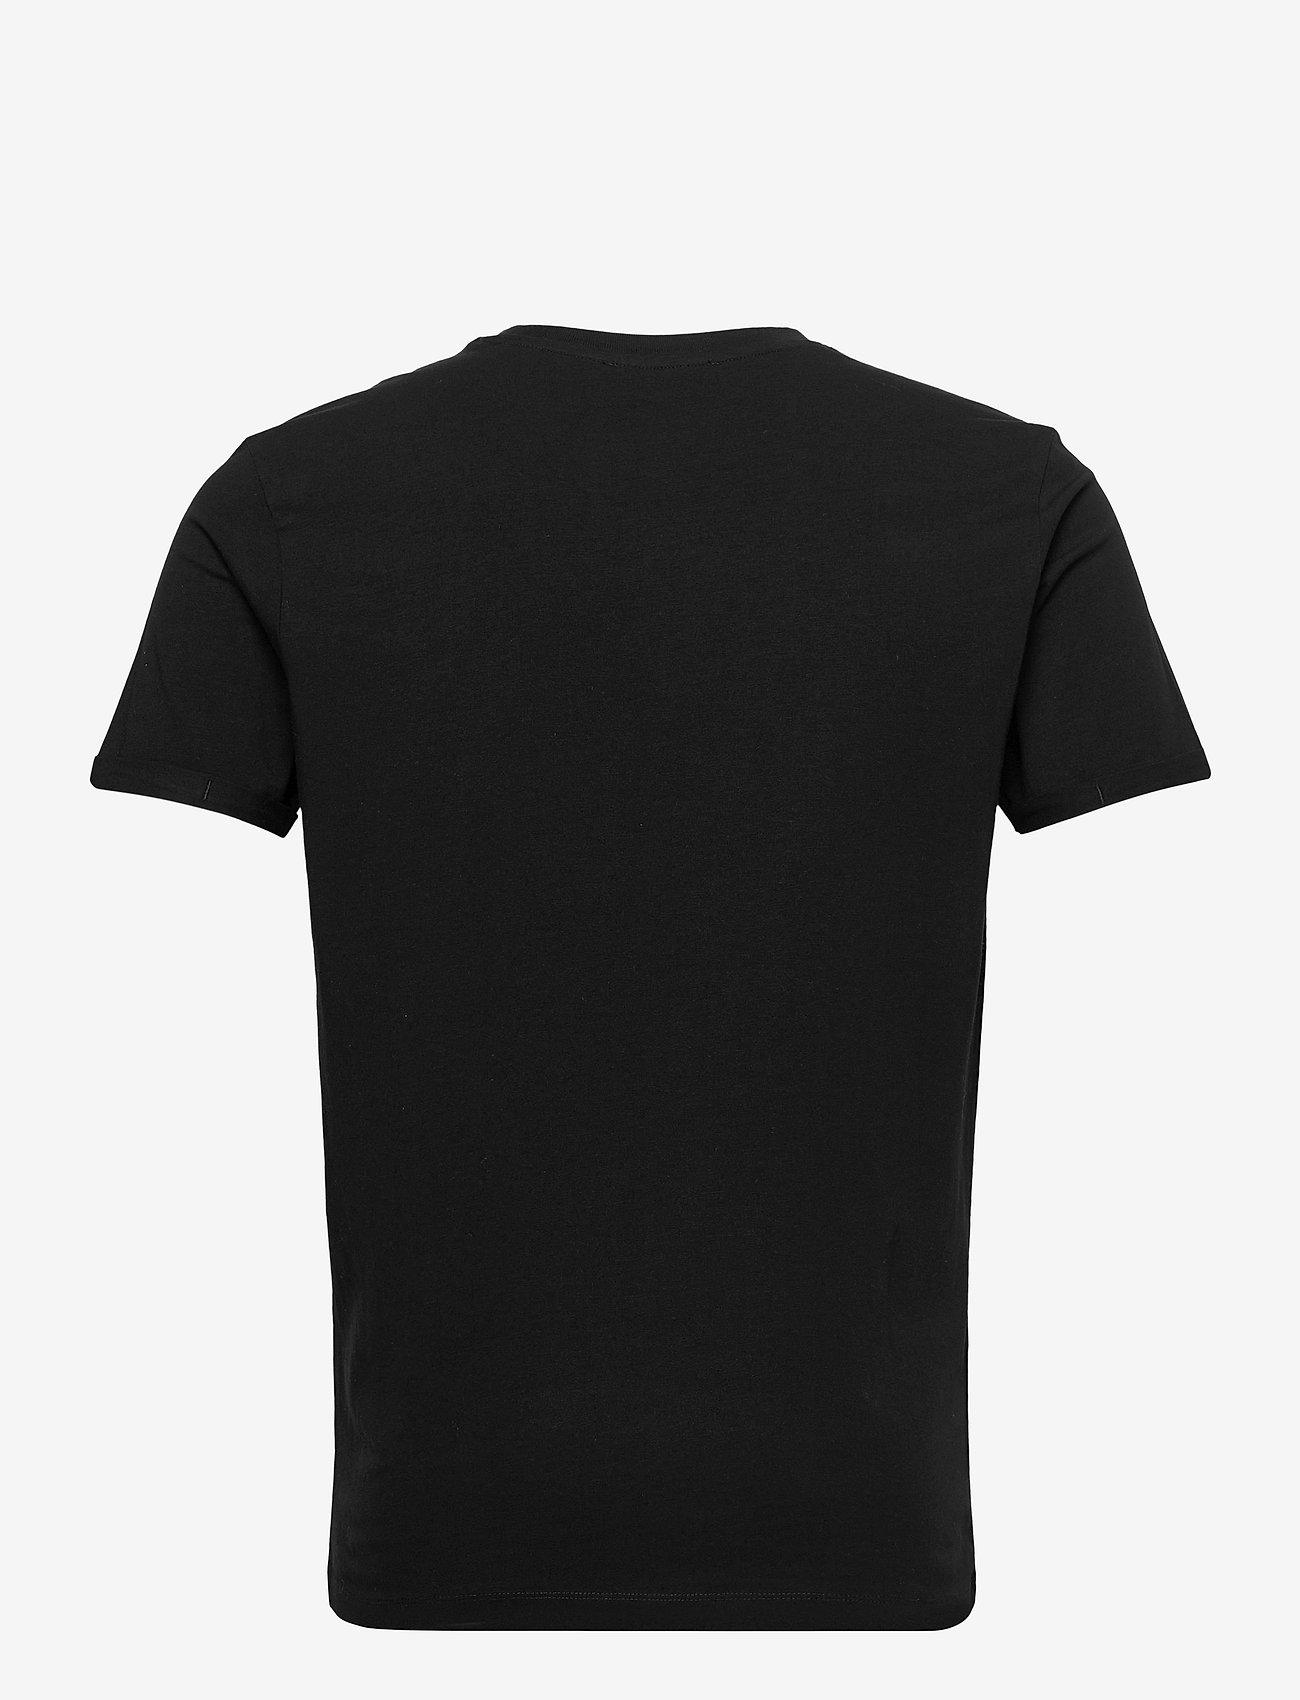 Jack & Jones - JPRBLALOGO SPRING TEE SS CREW NECK - basic t-shirts - black - 1